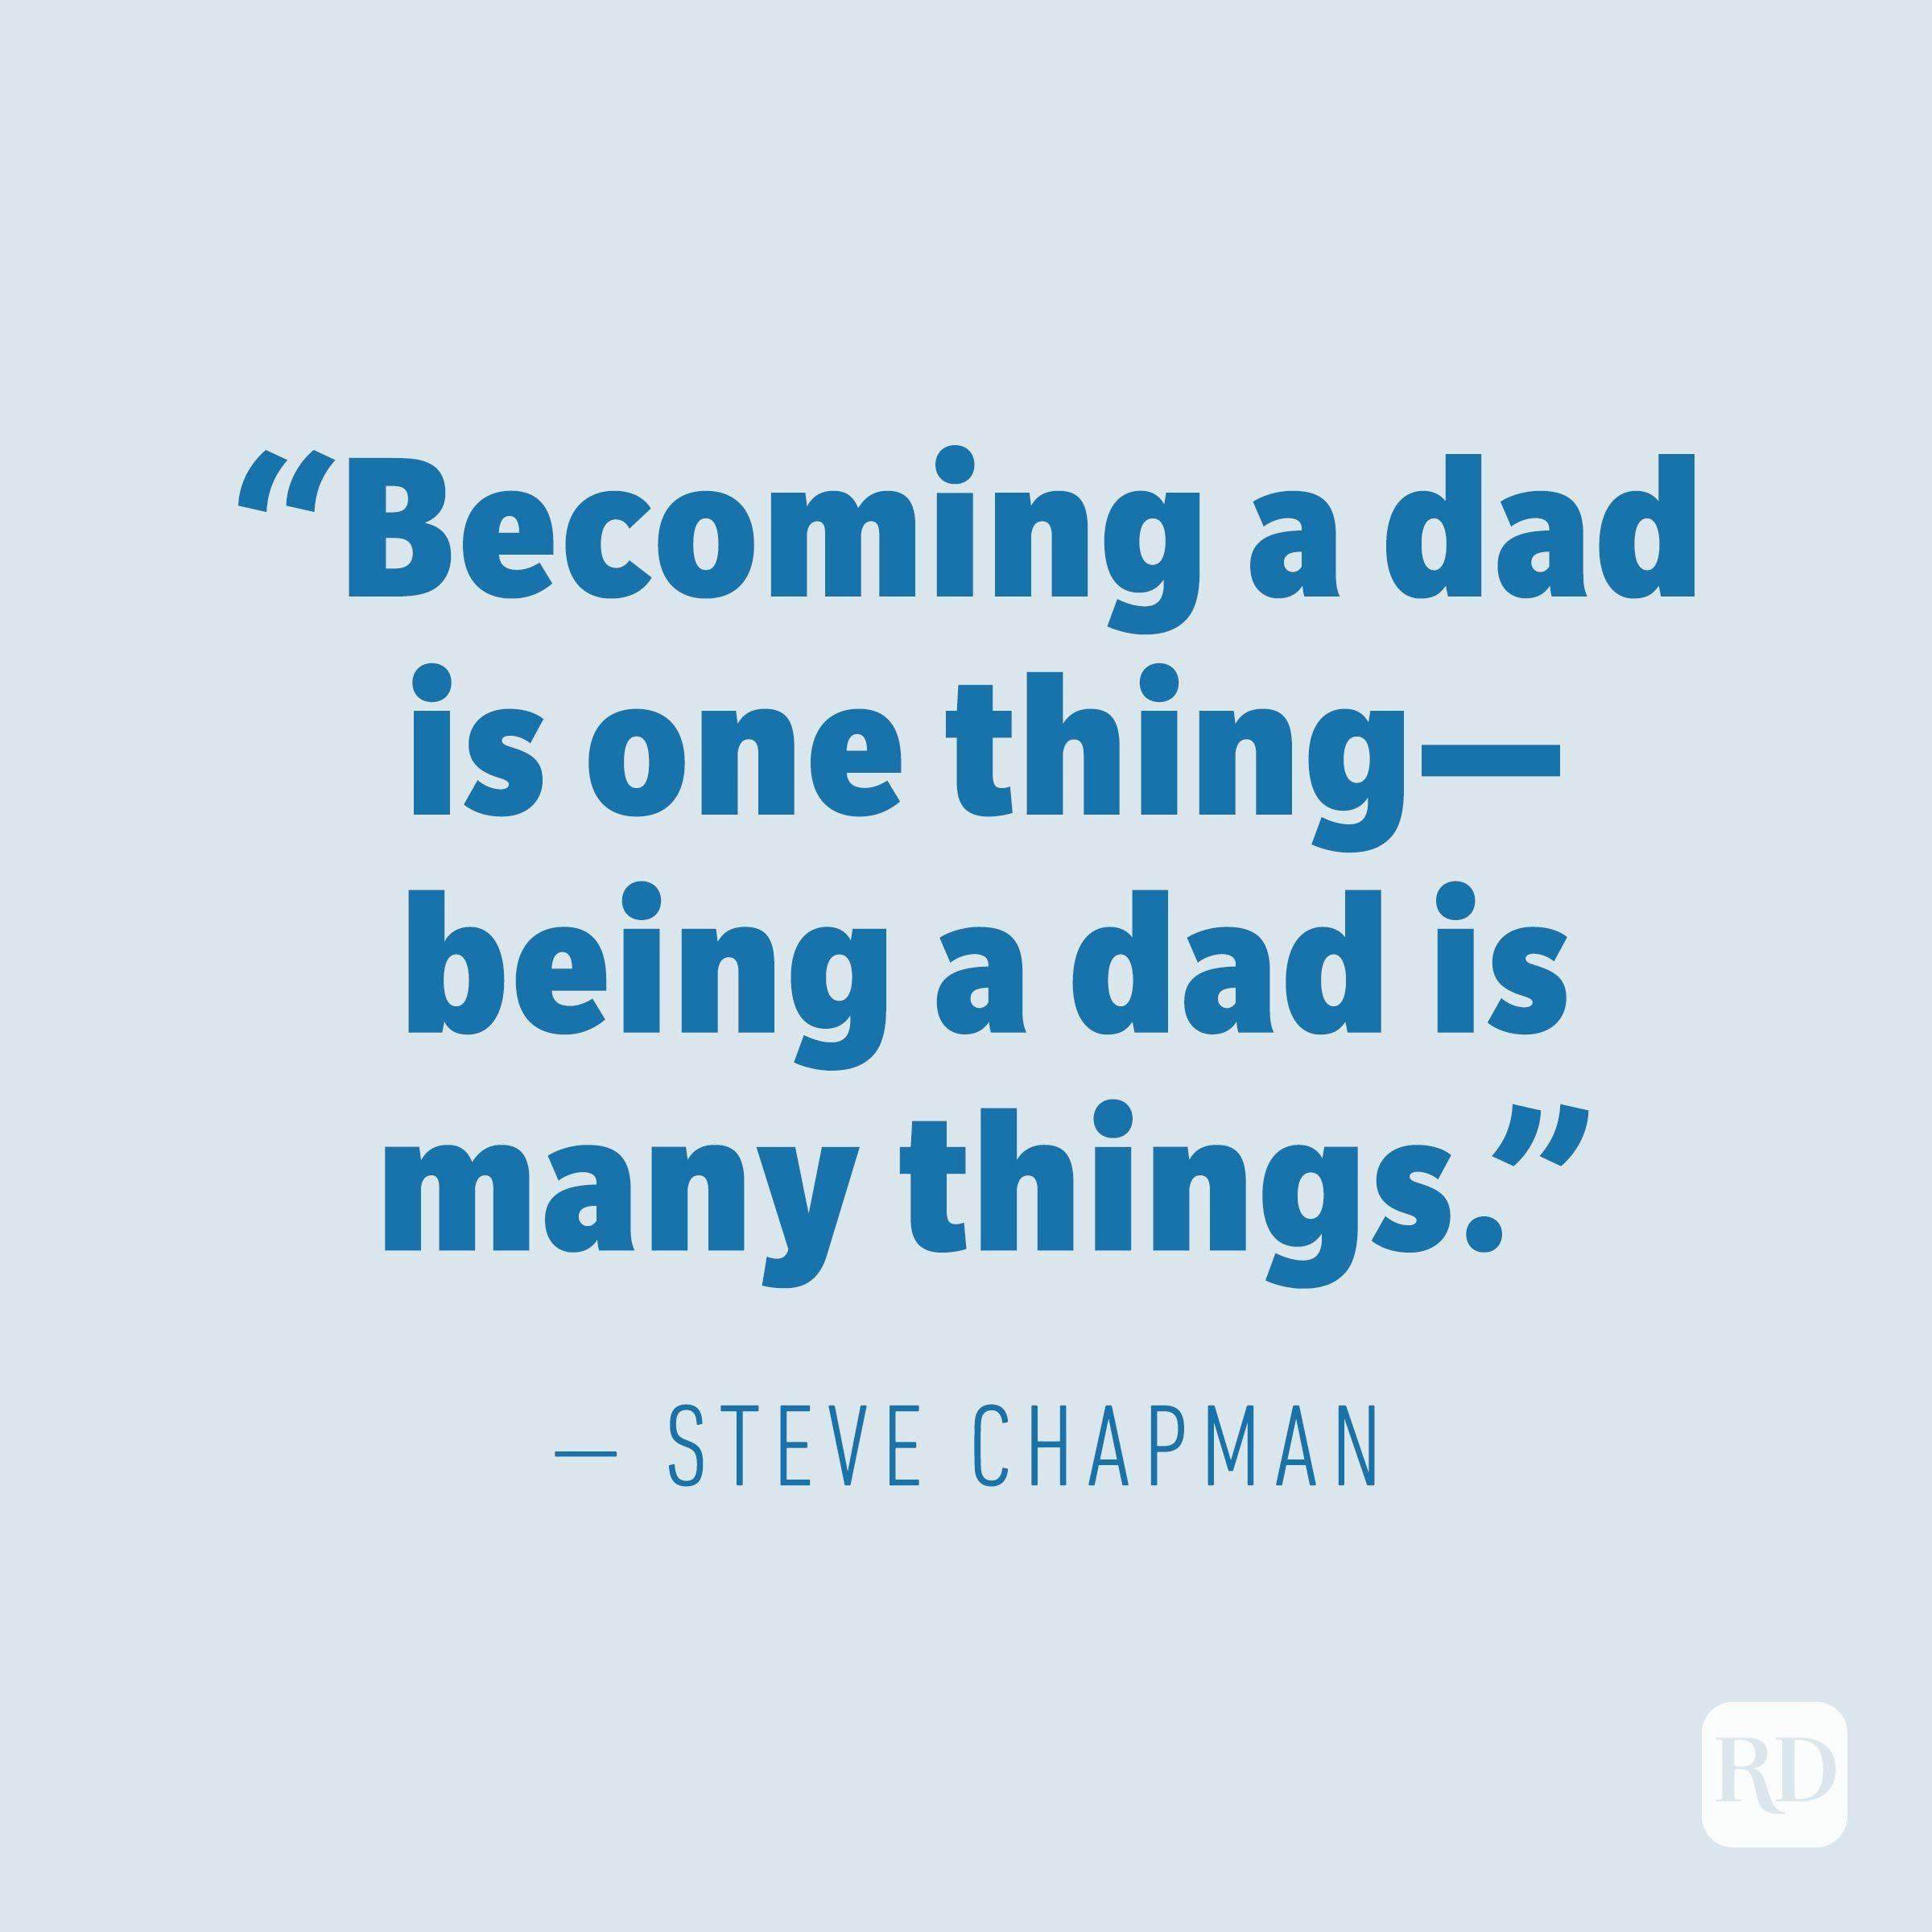 Steve Chapman quote